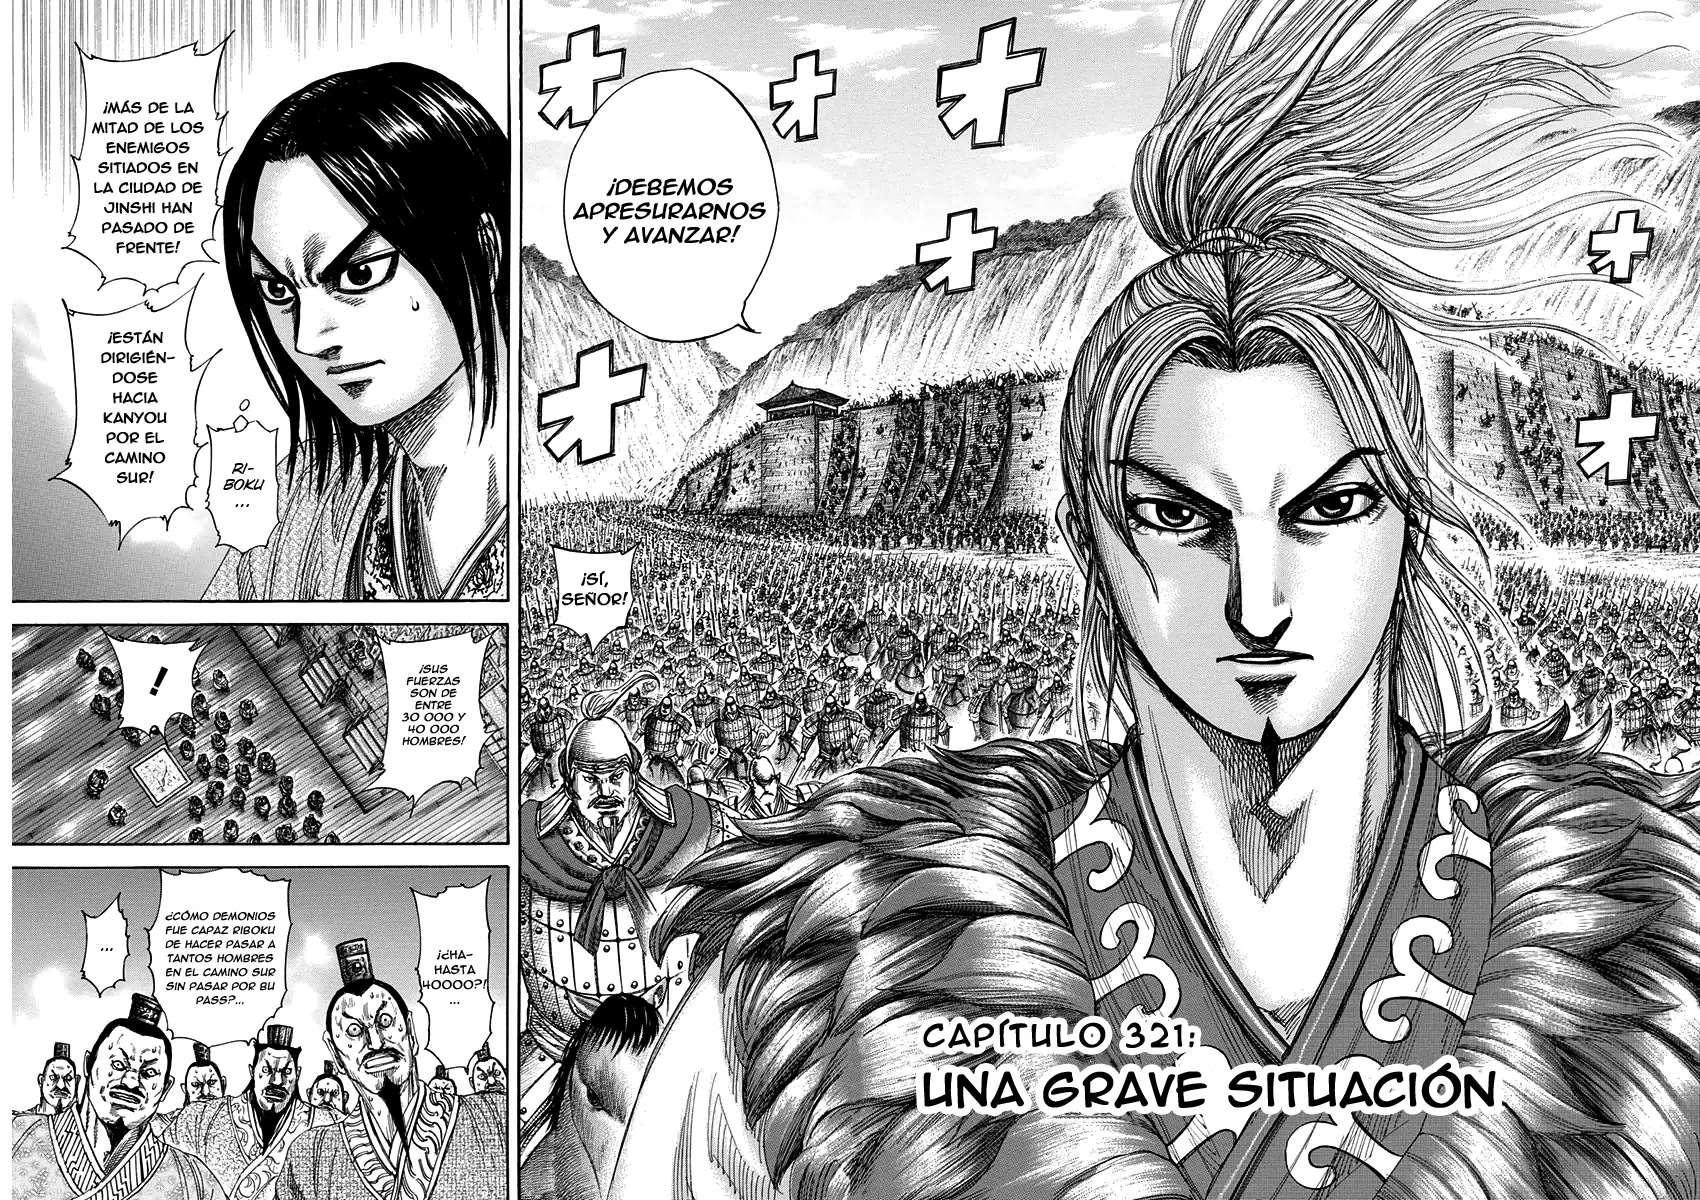 http://c5.ninemanga.com/es_manga/19/12307/360904/0e362248114ca96858d984e091c0d812.jpg Page 3